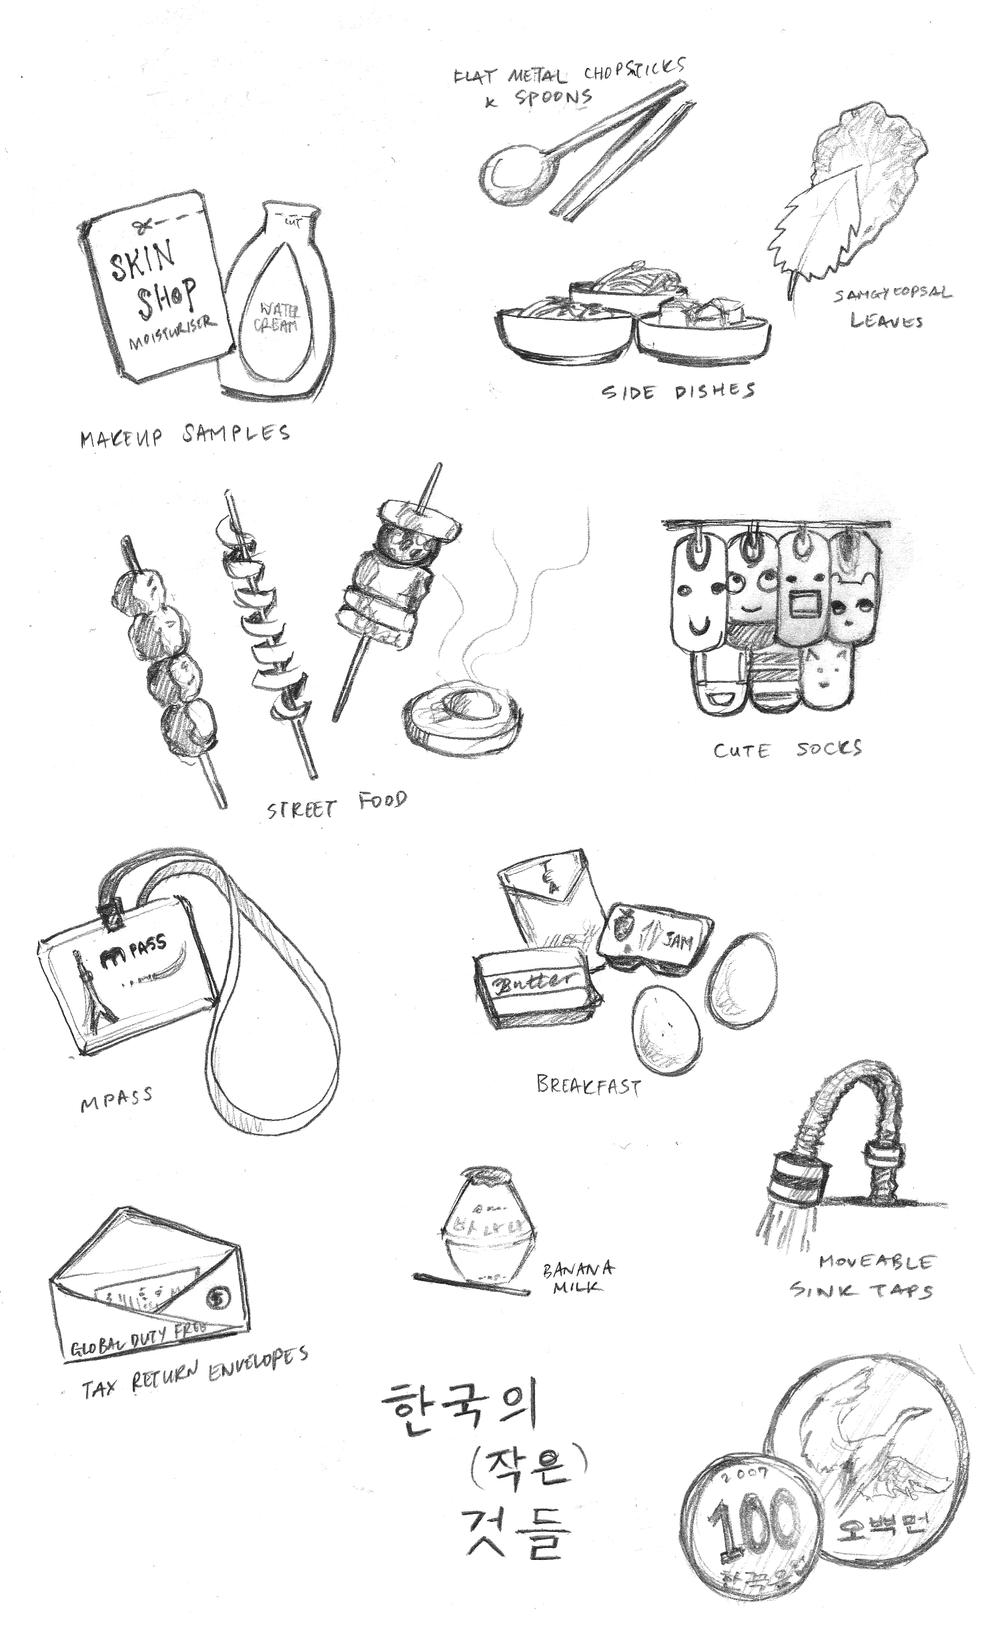 seoul, korea, south korea, sketch and run, small things, art, illustration, makeup samples, banana milk, socks, ddukboki